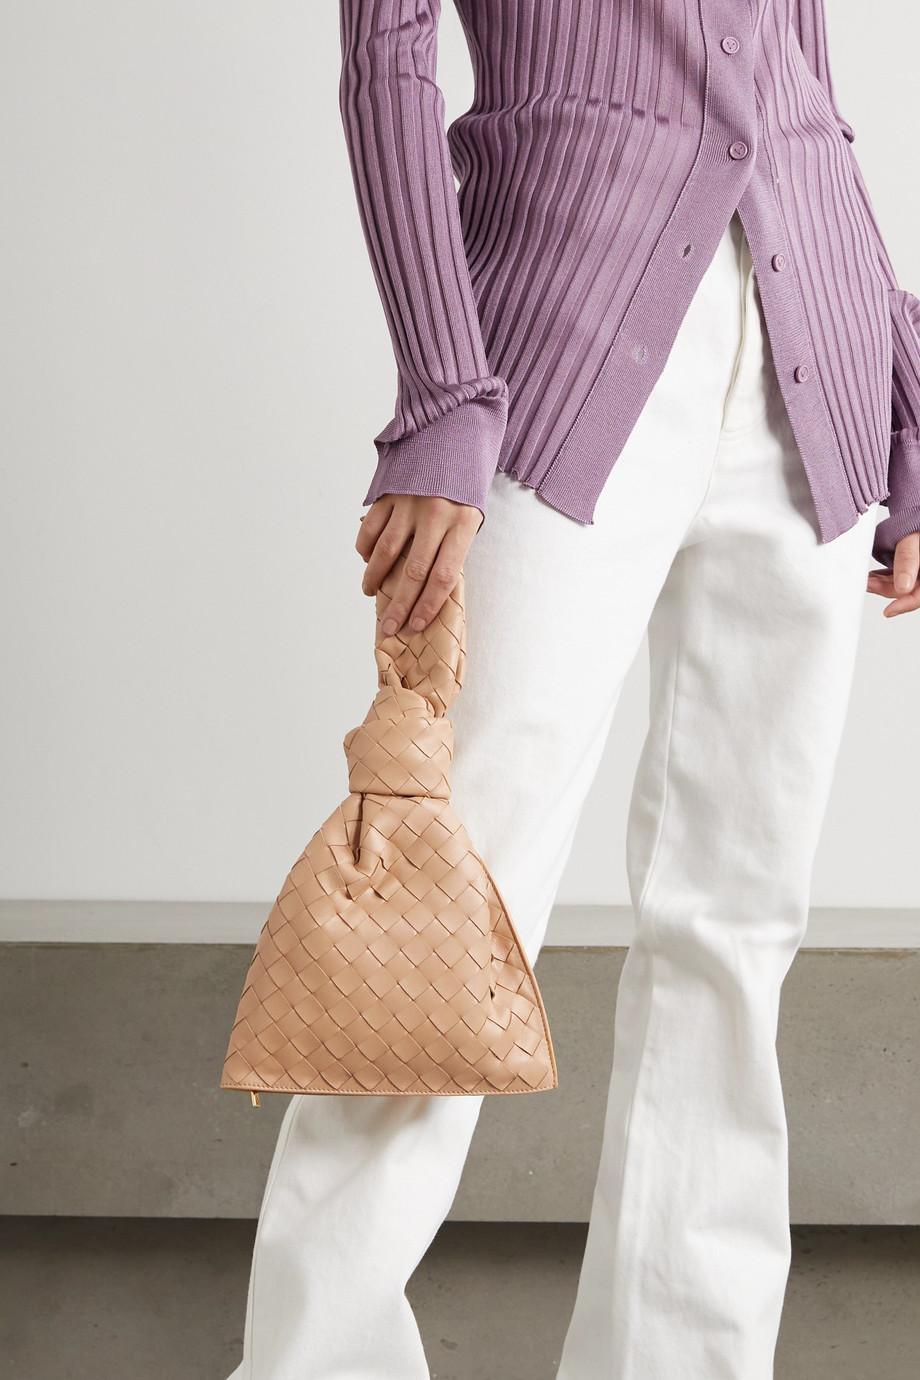 Bottega Veneta The Mini Twist Clutch aus Intrecciato-Leder mit Knoten